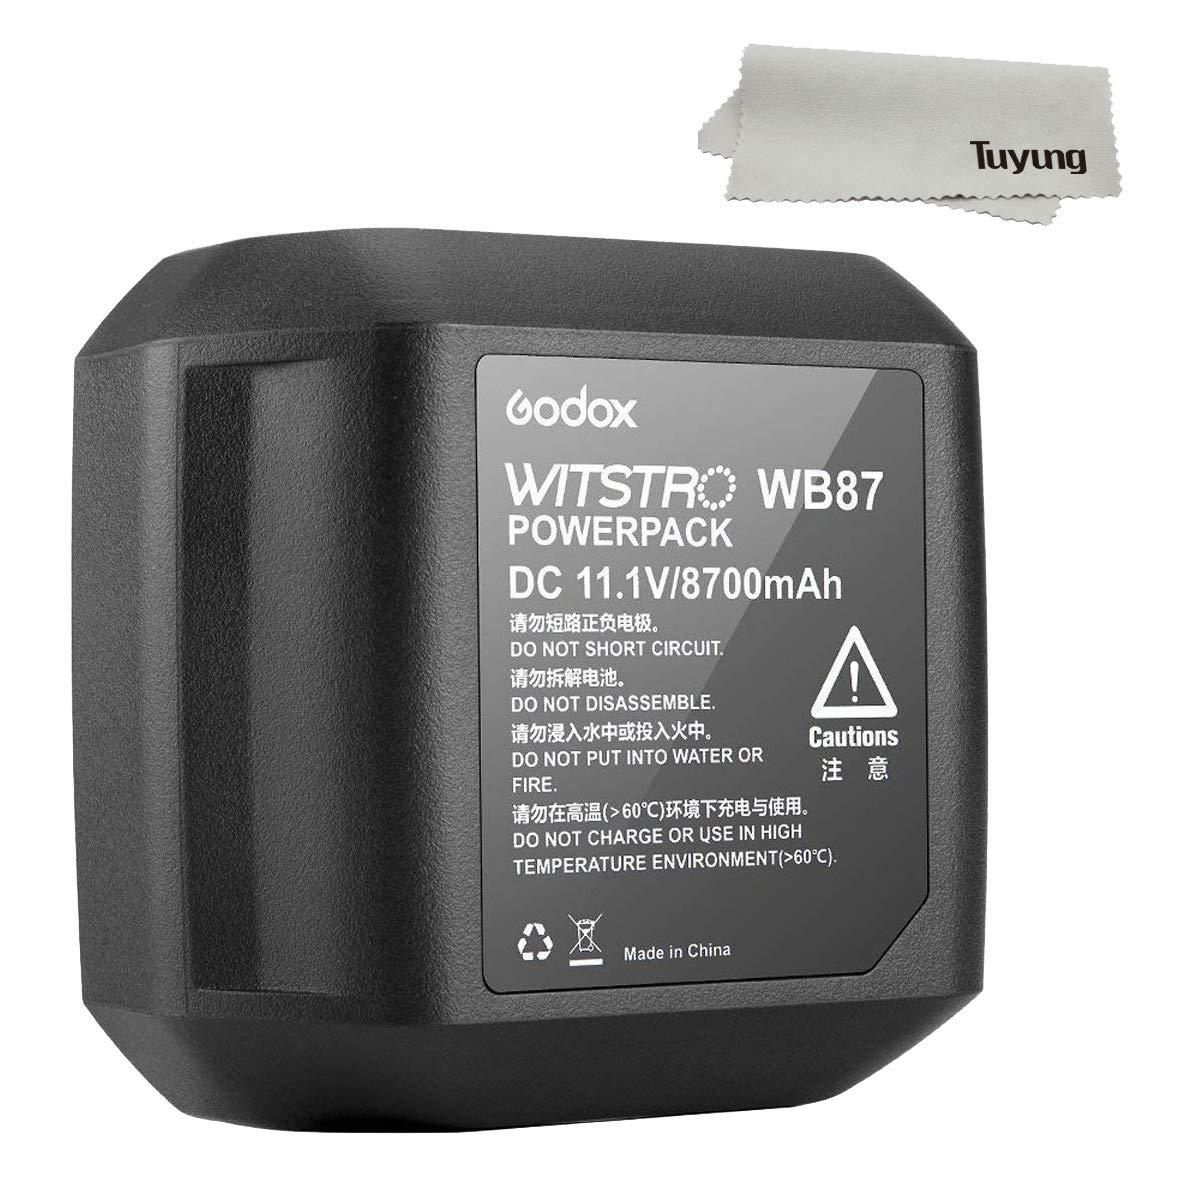 Godox Battery Pack 11.1V 8700mAh for AD600 AD600B AD600BM AD600M Studio Flashes by Godox